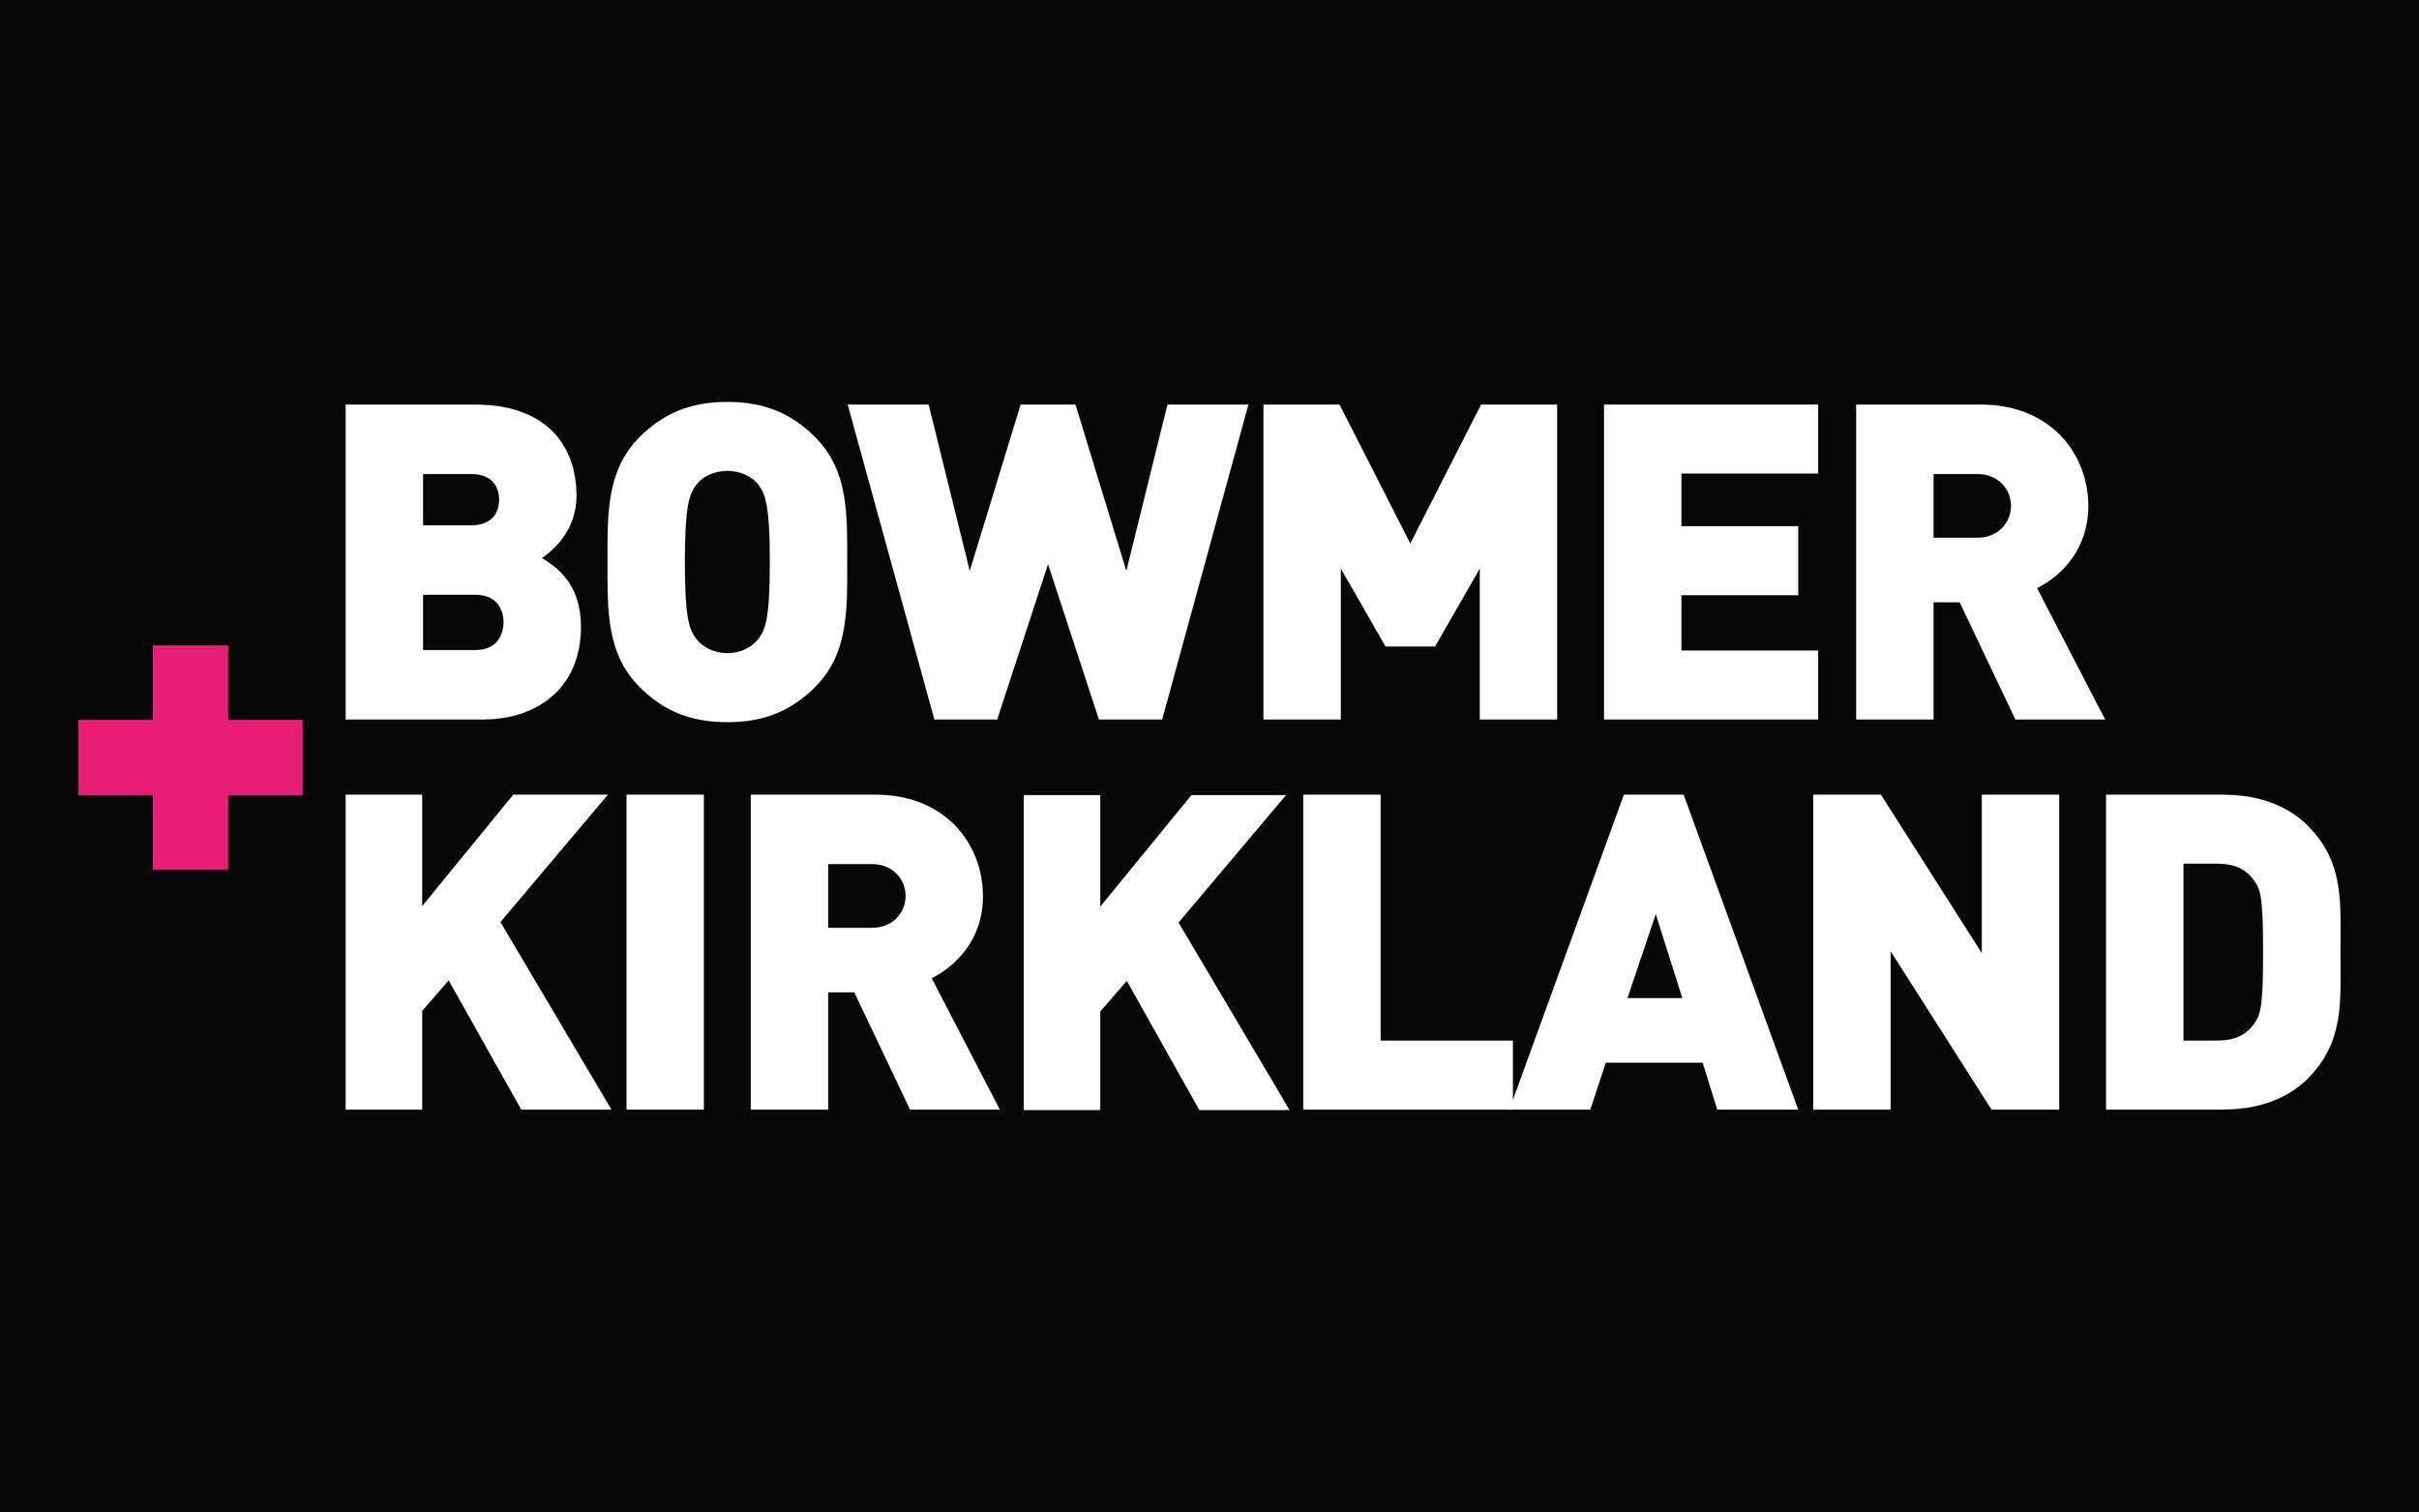 bowmer kirkland.png